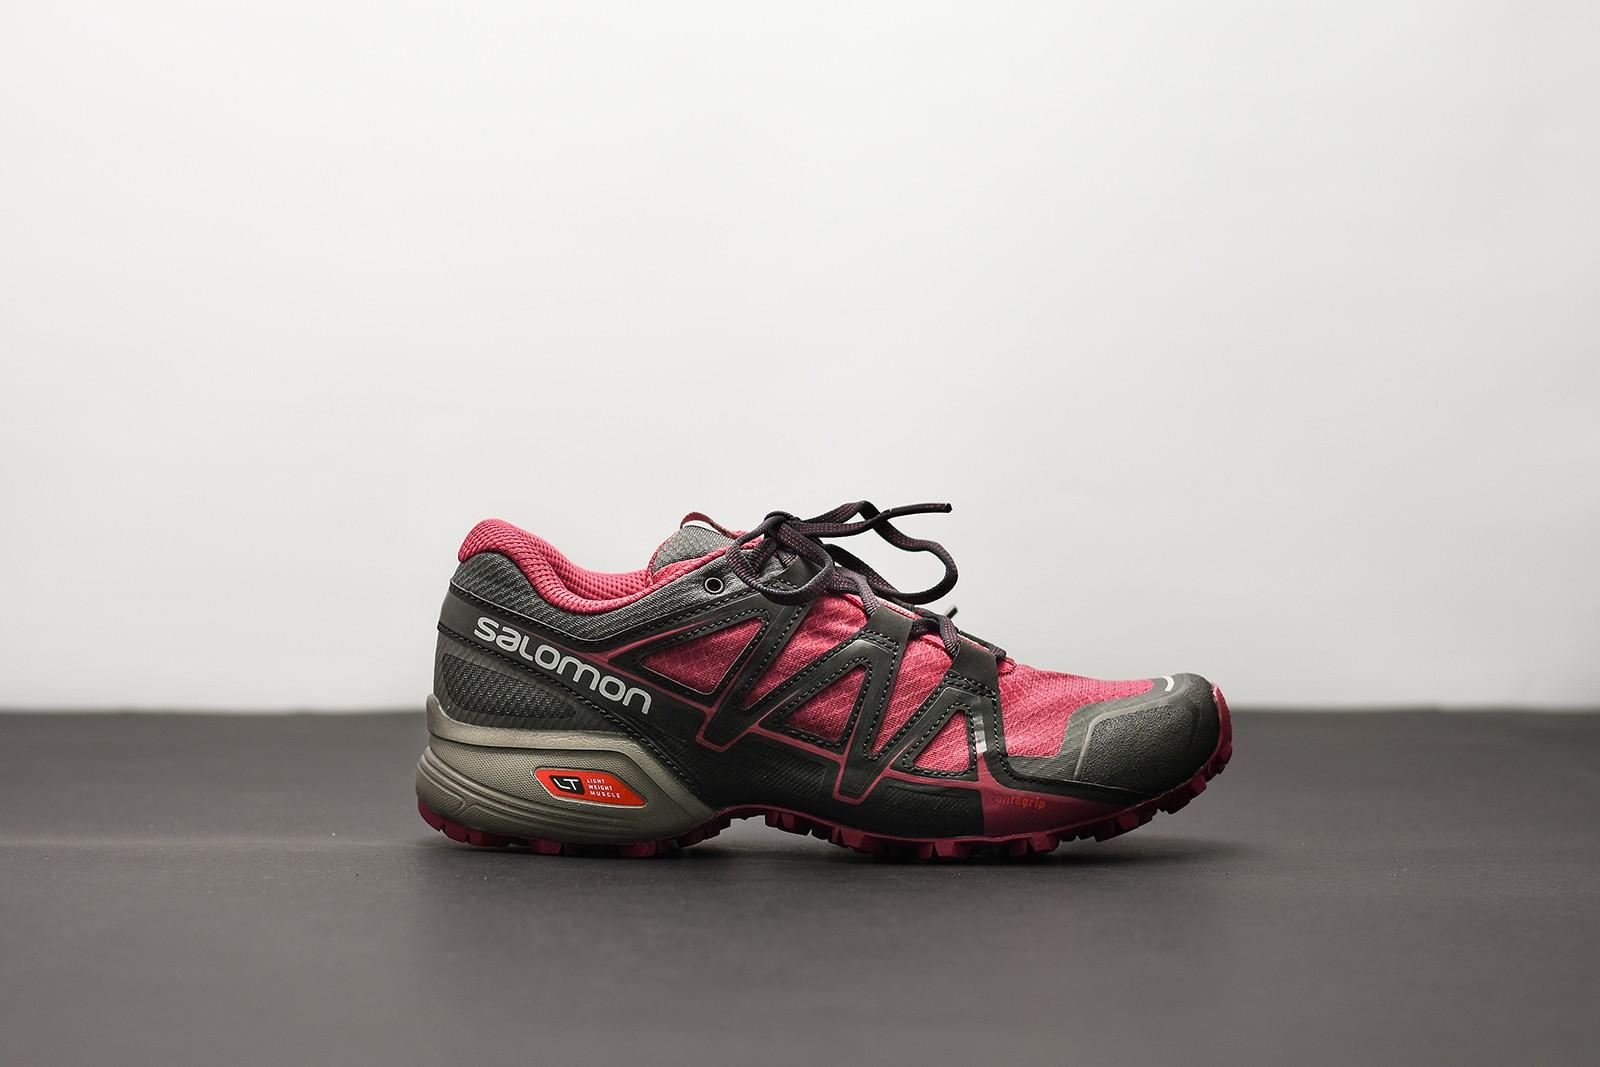 Dámské Běžecké boty Salomon SPEEDCROSS VARIO 2 W Sangria M  c7d36fb034